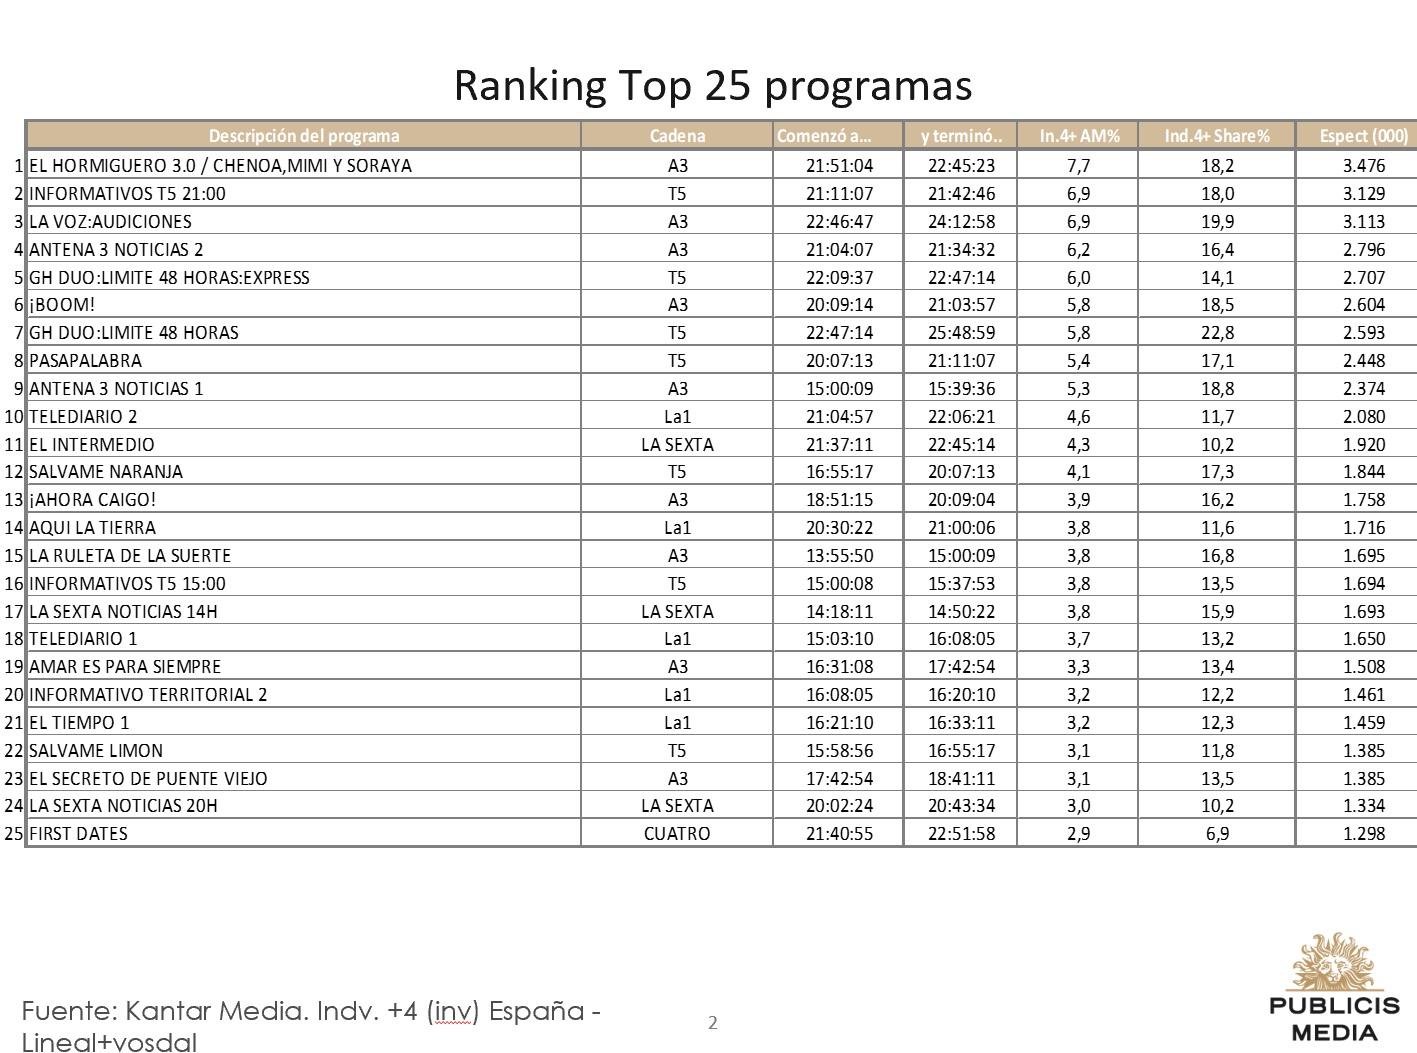 http://www.programapublicidad.com/wp-content/uploads/2019/02/Top-25-Publicis-media-5-feb2019-programapublicidad-muy-grande-1.jpg